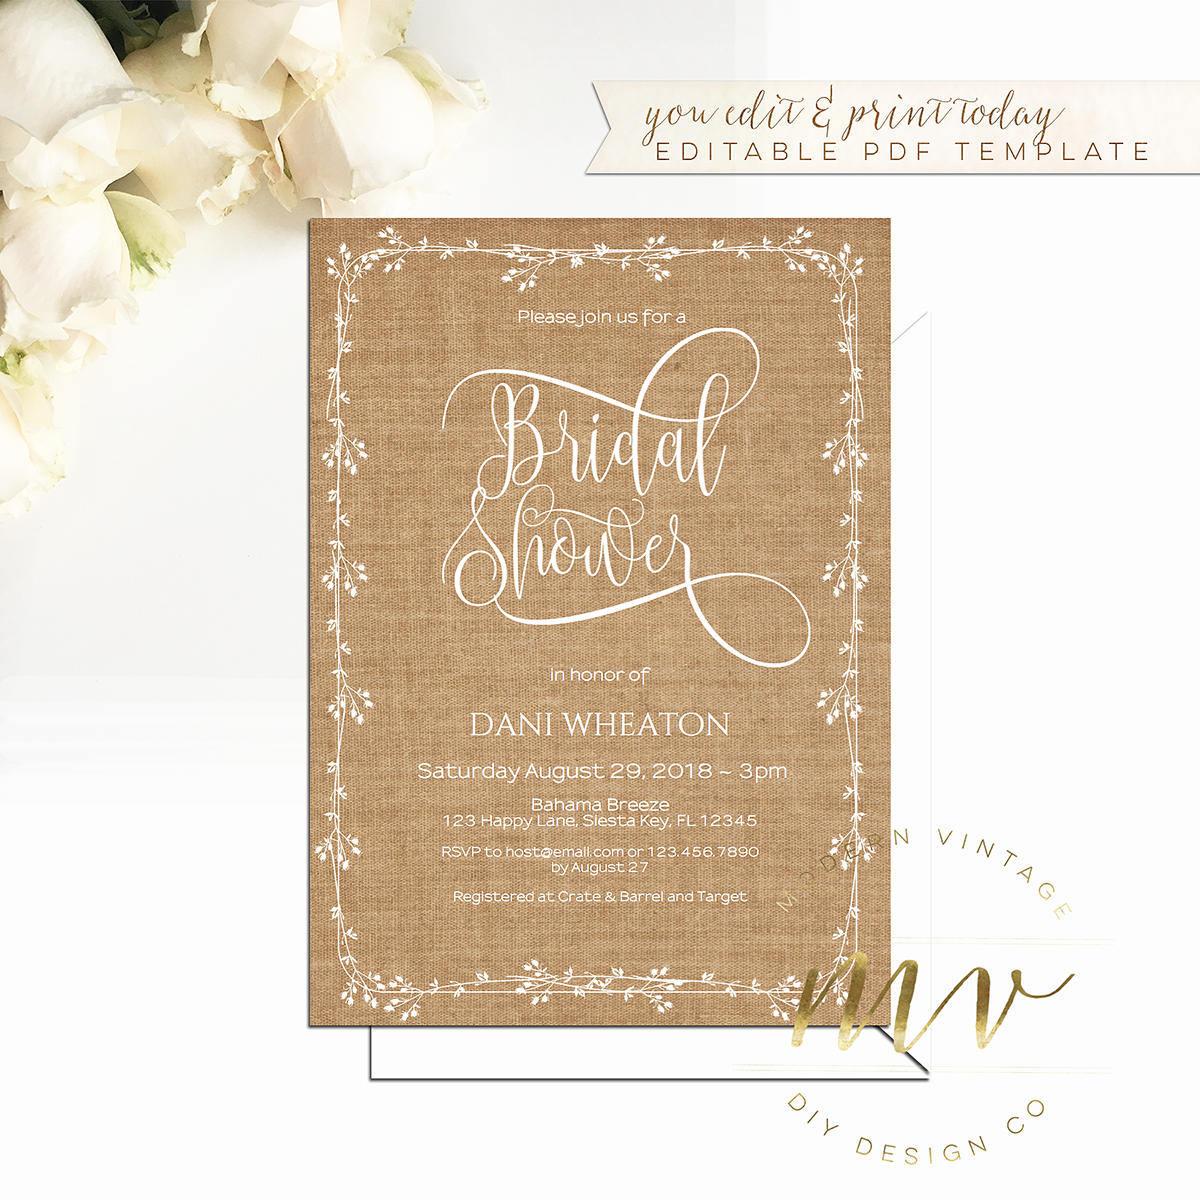 bridal shower invitation template 5x7 editable printable. Black Bedroom Furniture Sets. Home Design Ideas